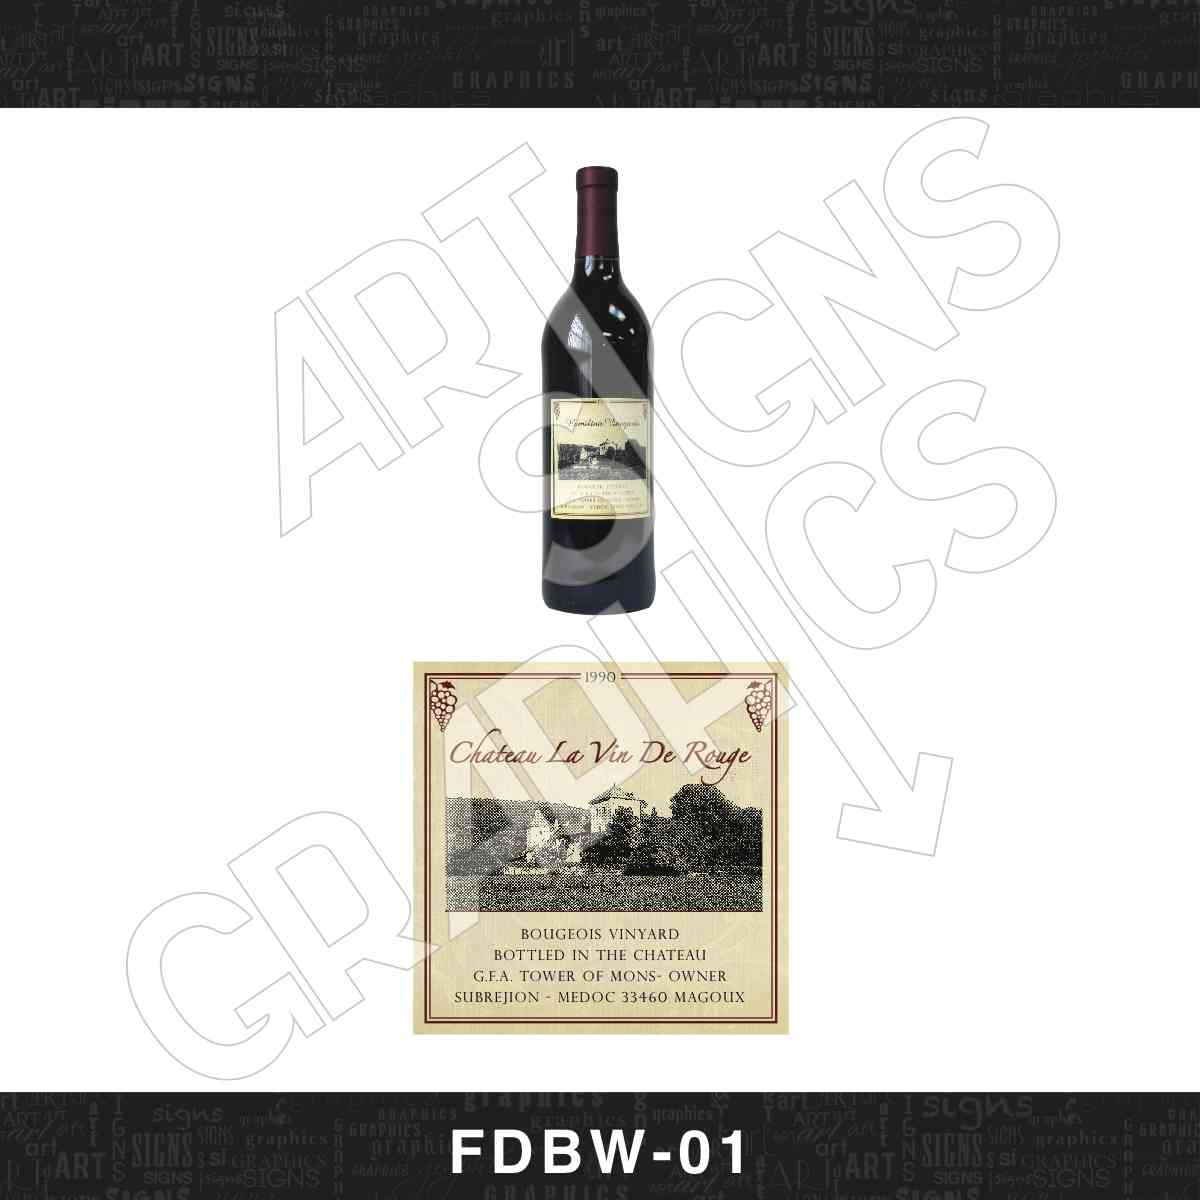 FDBW-01.jpg